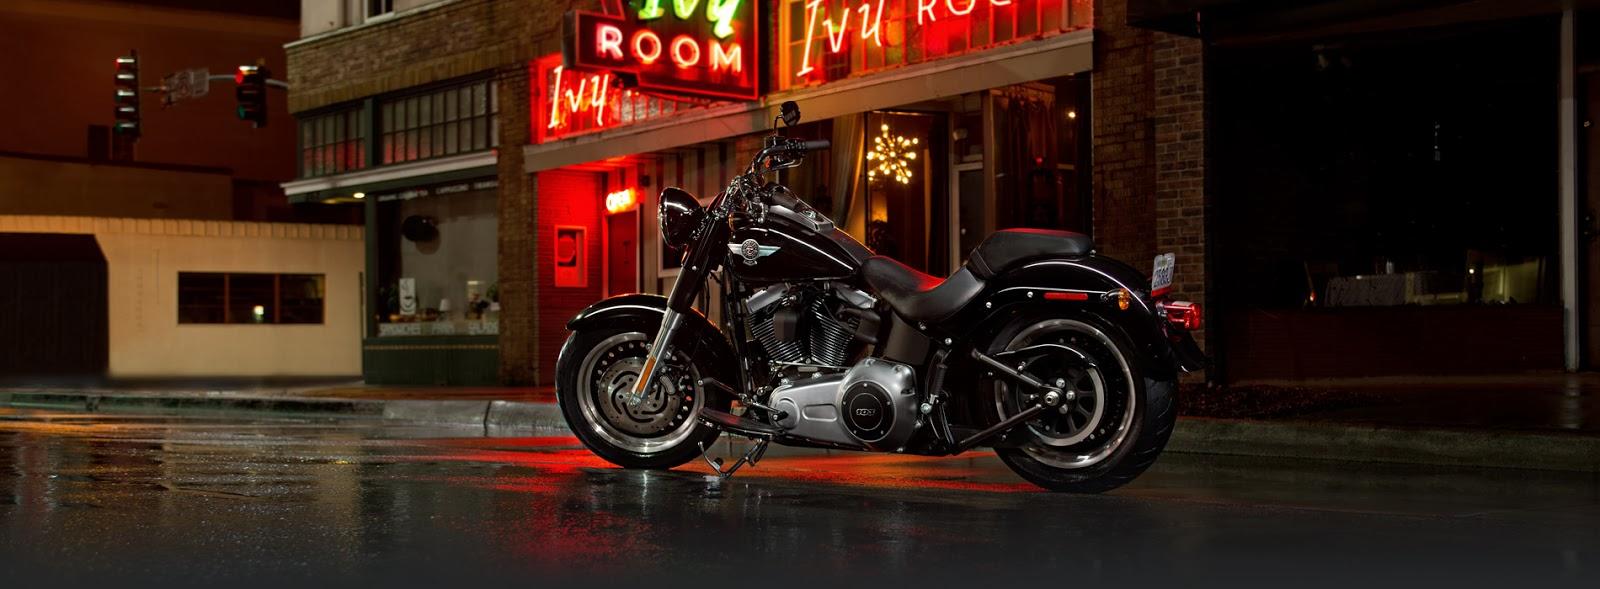 Bike & Cars HD Wallpapers: Harley Davidson Motorcycle Photos